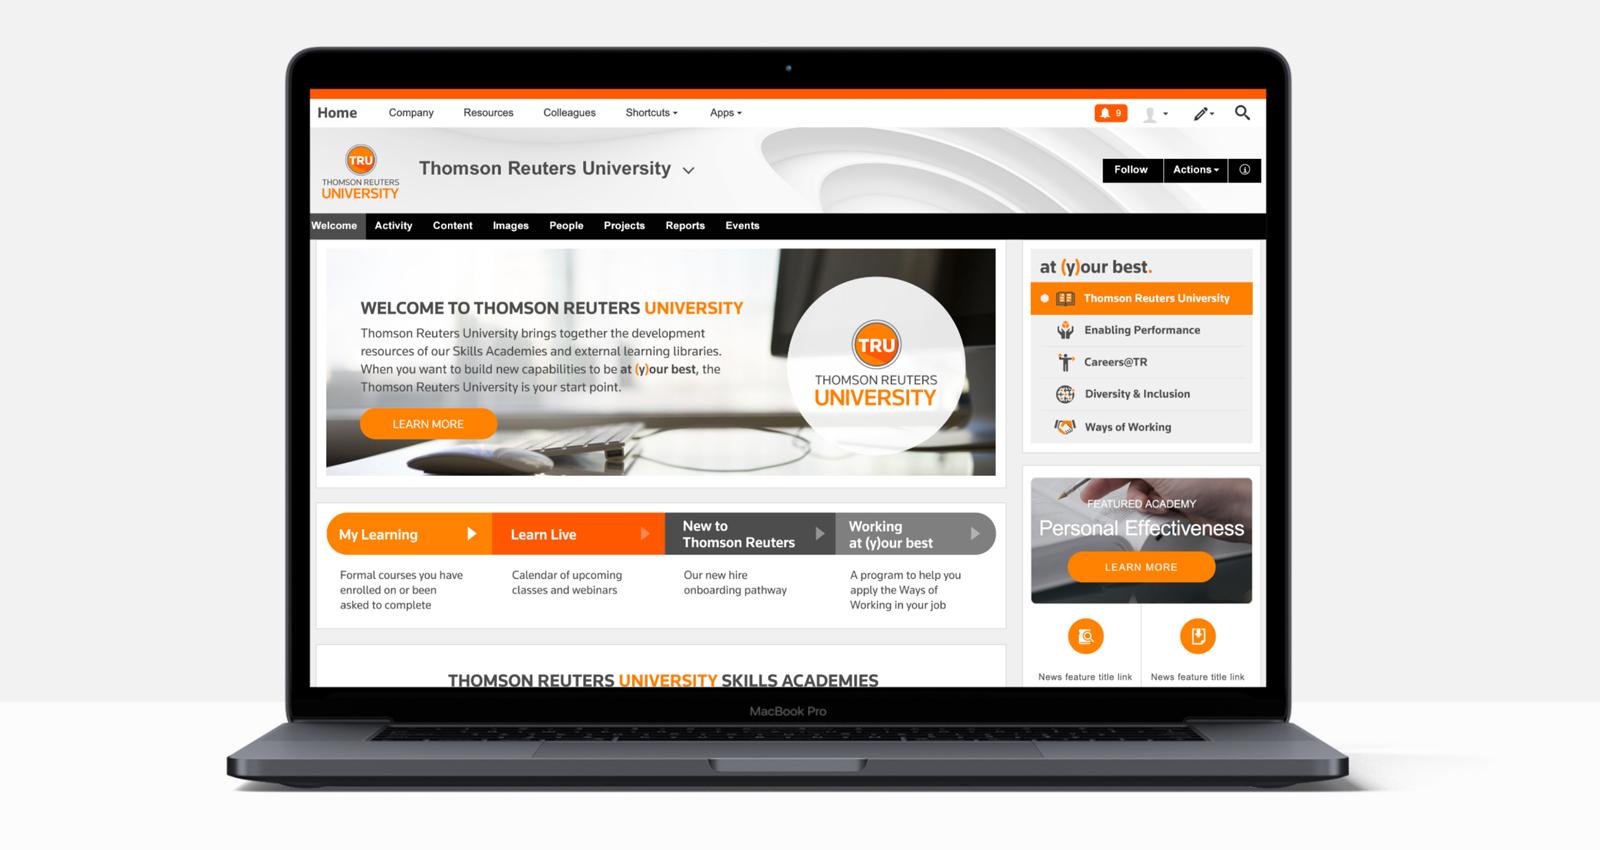 Thomson Reuters University